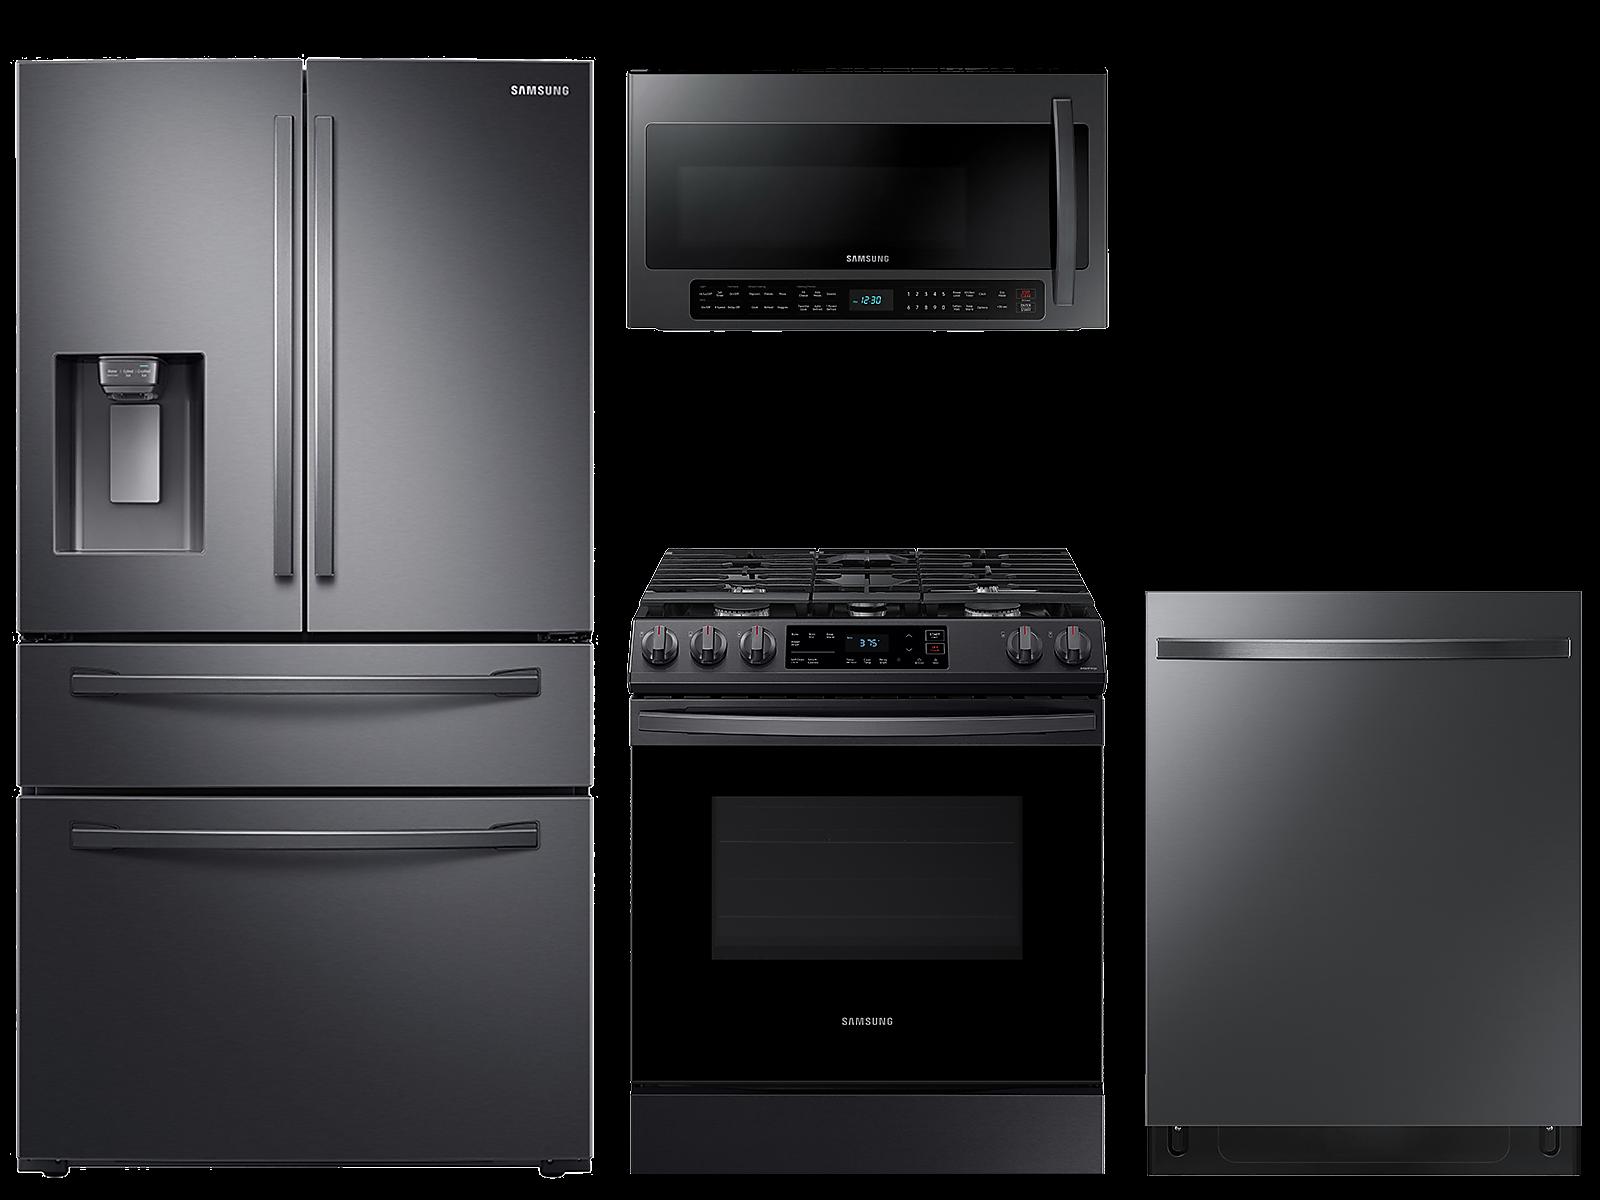 Samsung coupon: Samsung 28 cu. ft. 4-door refrigerator, gas range, 2.1 cu. ft. microwave and 48 dBA modern-look dishwasher package(BNDL-1614027661824)